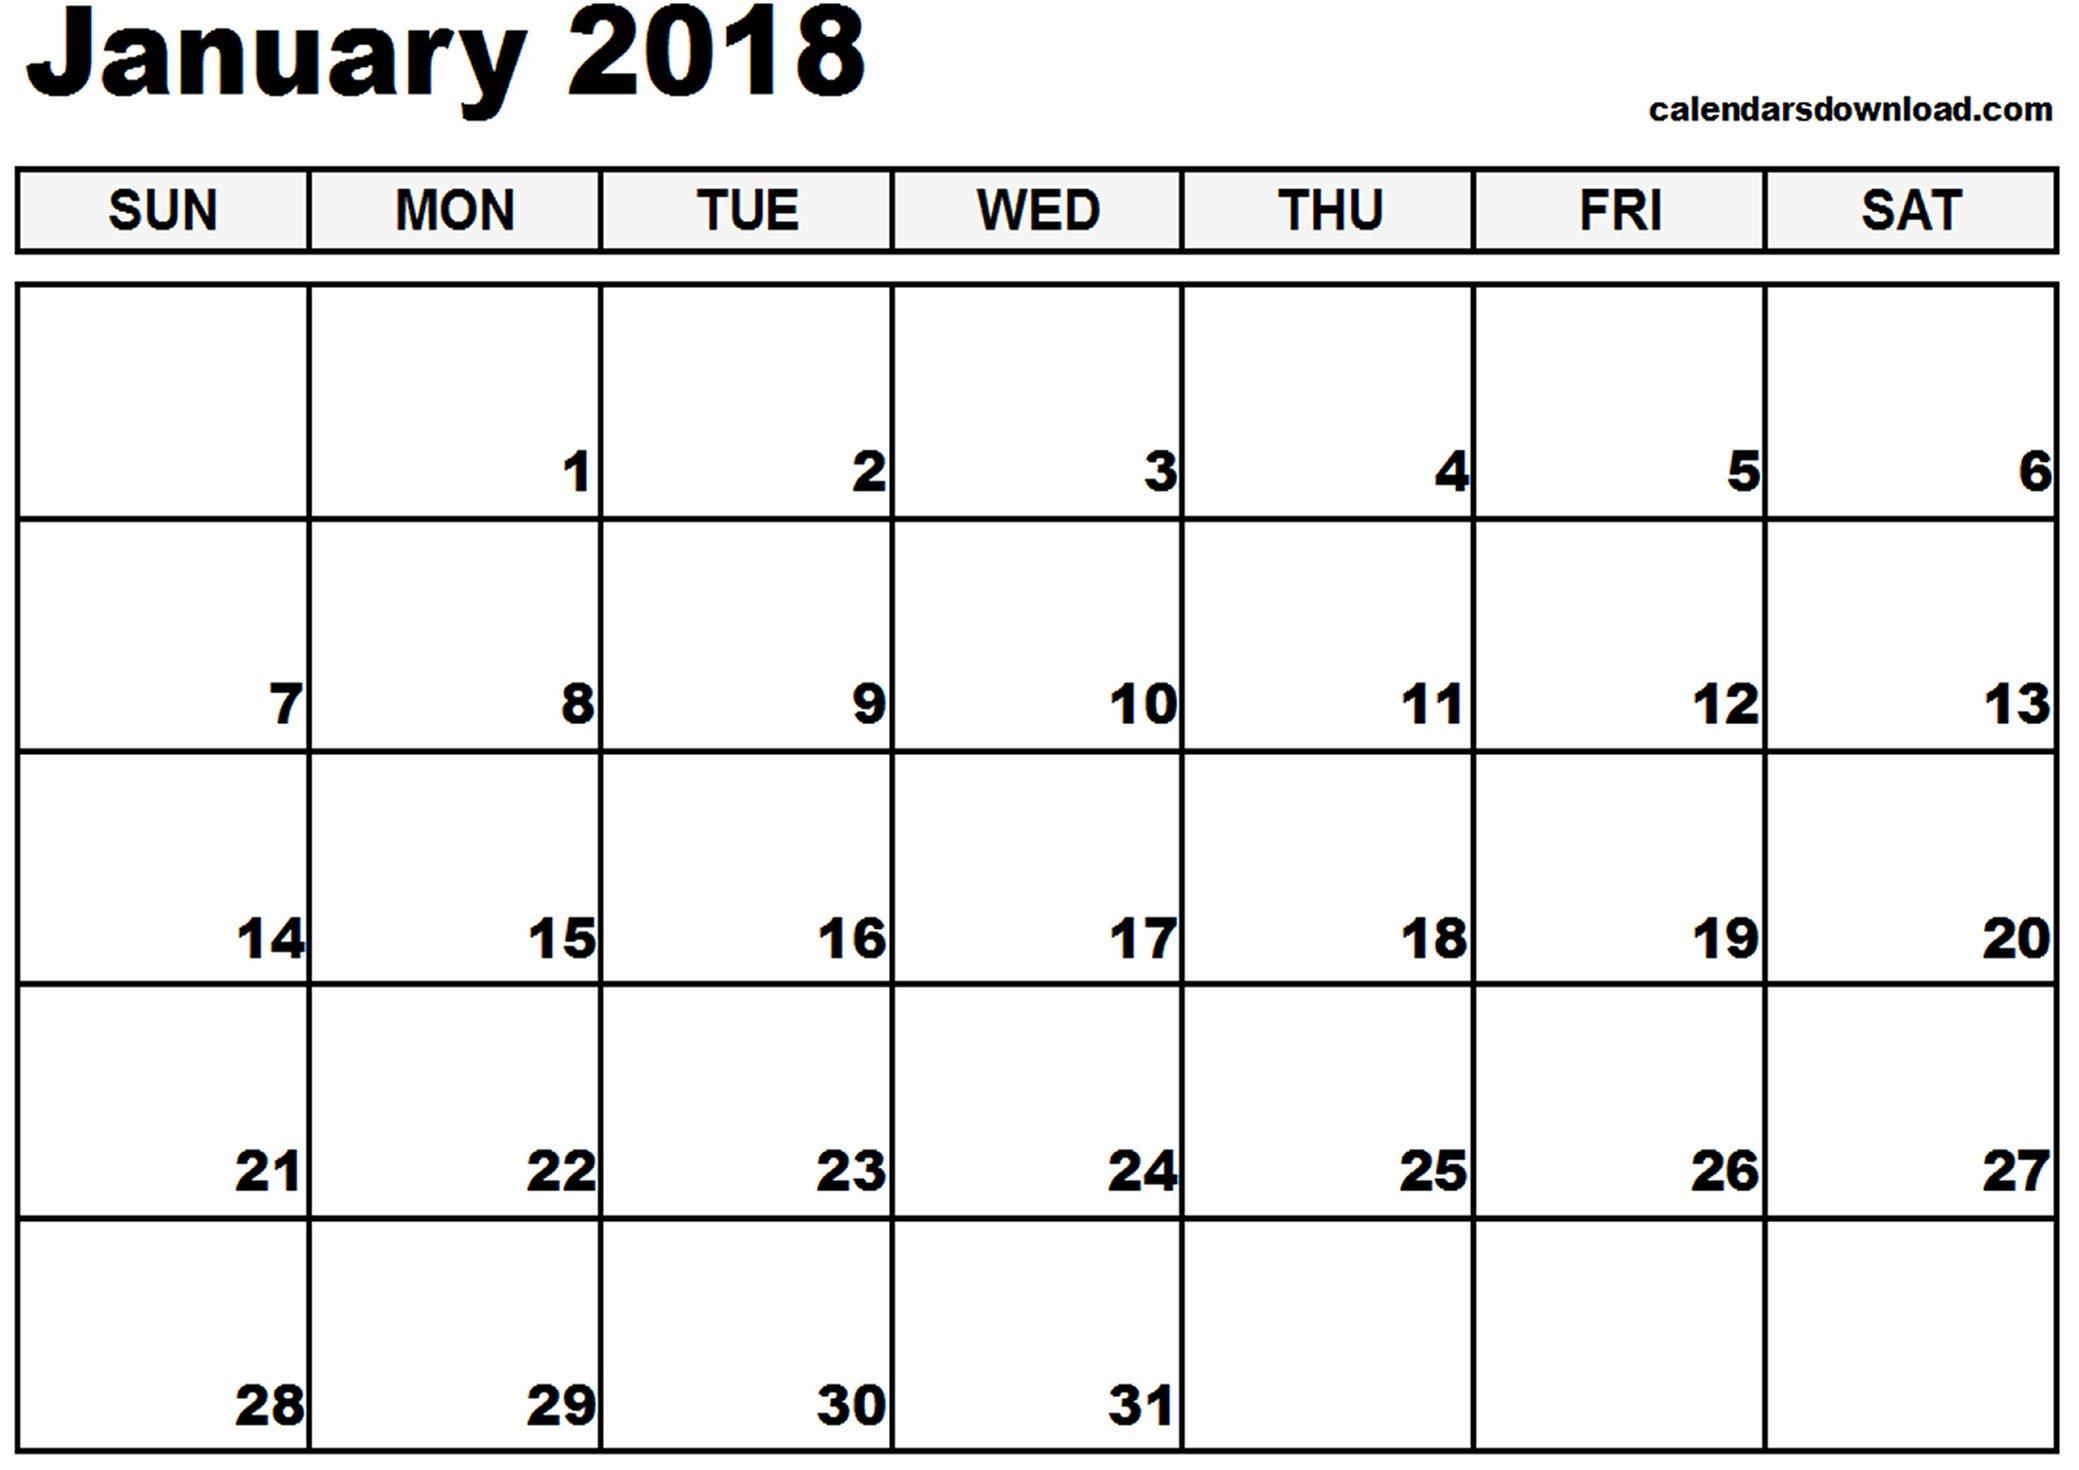 january 2018 calendar template 1622